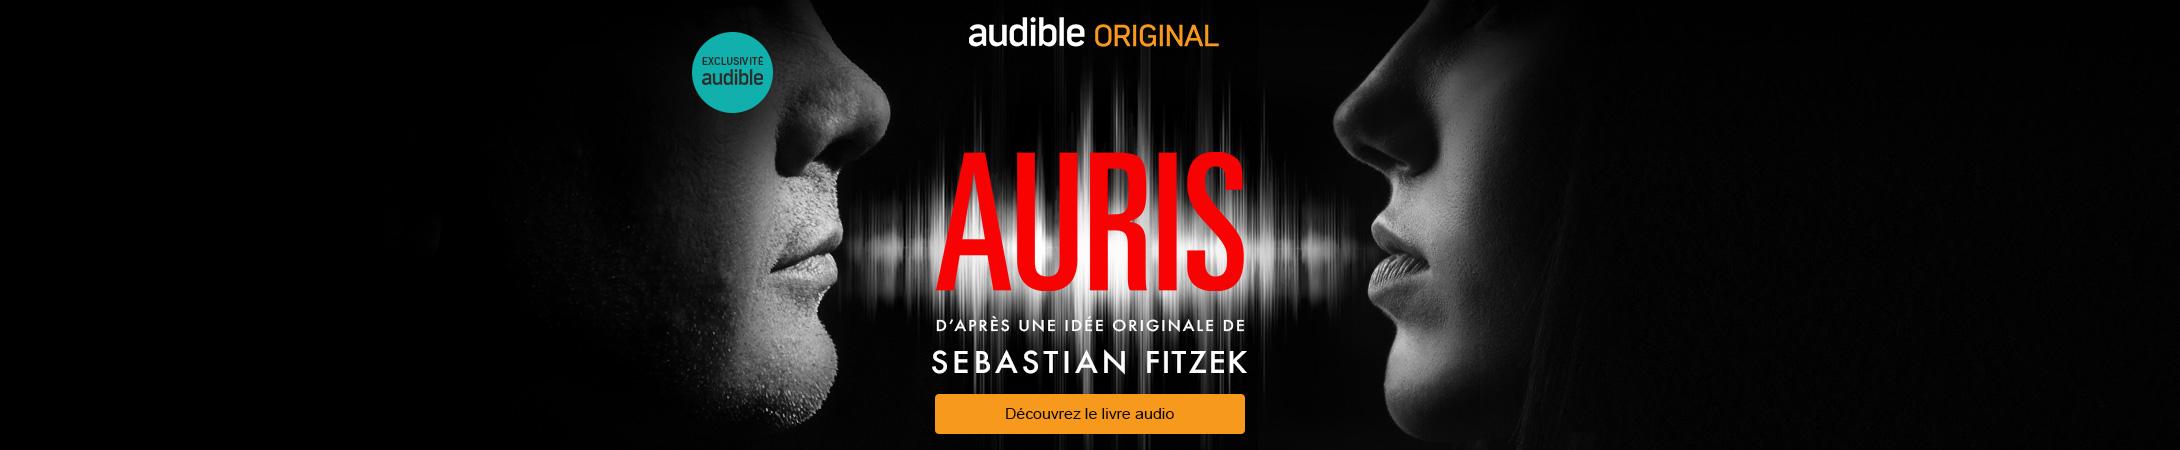 Audible Original : Auris